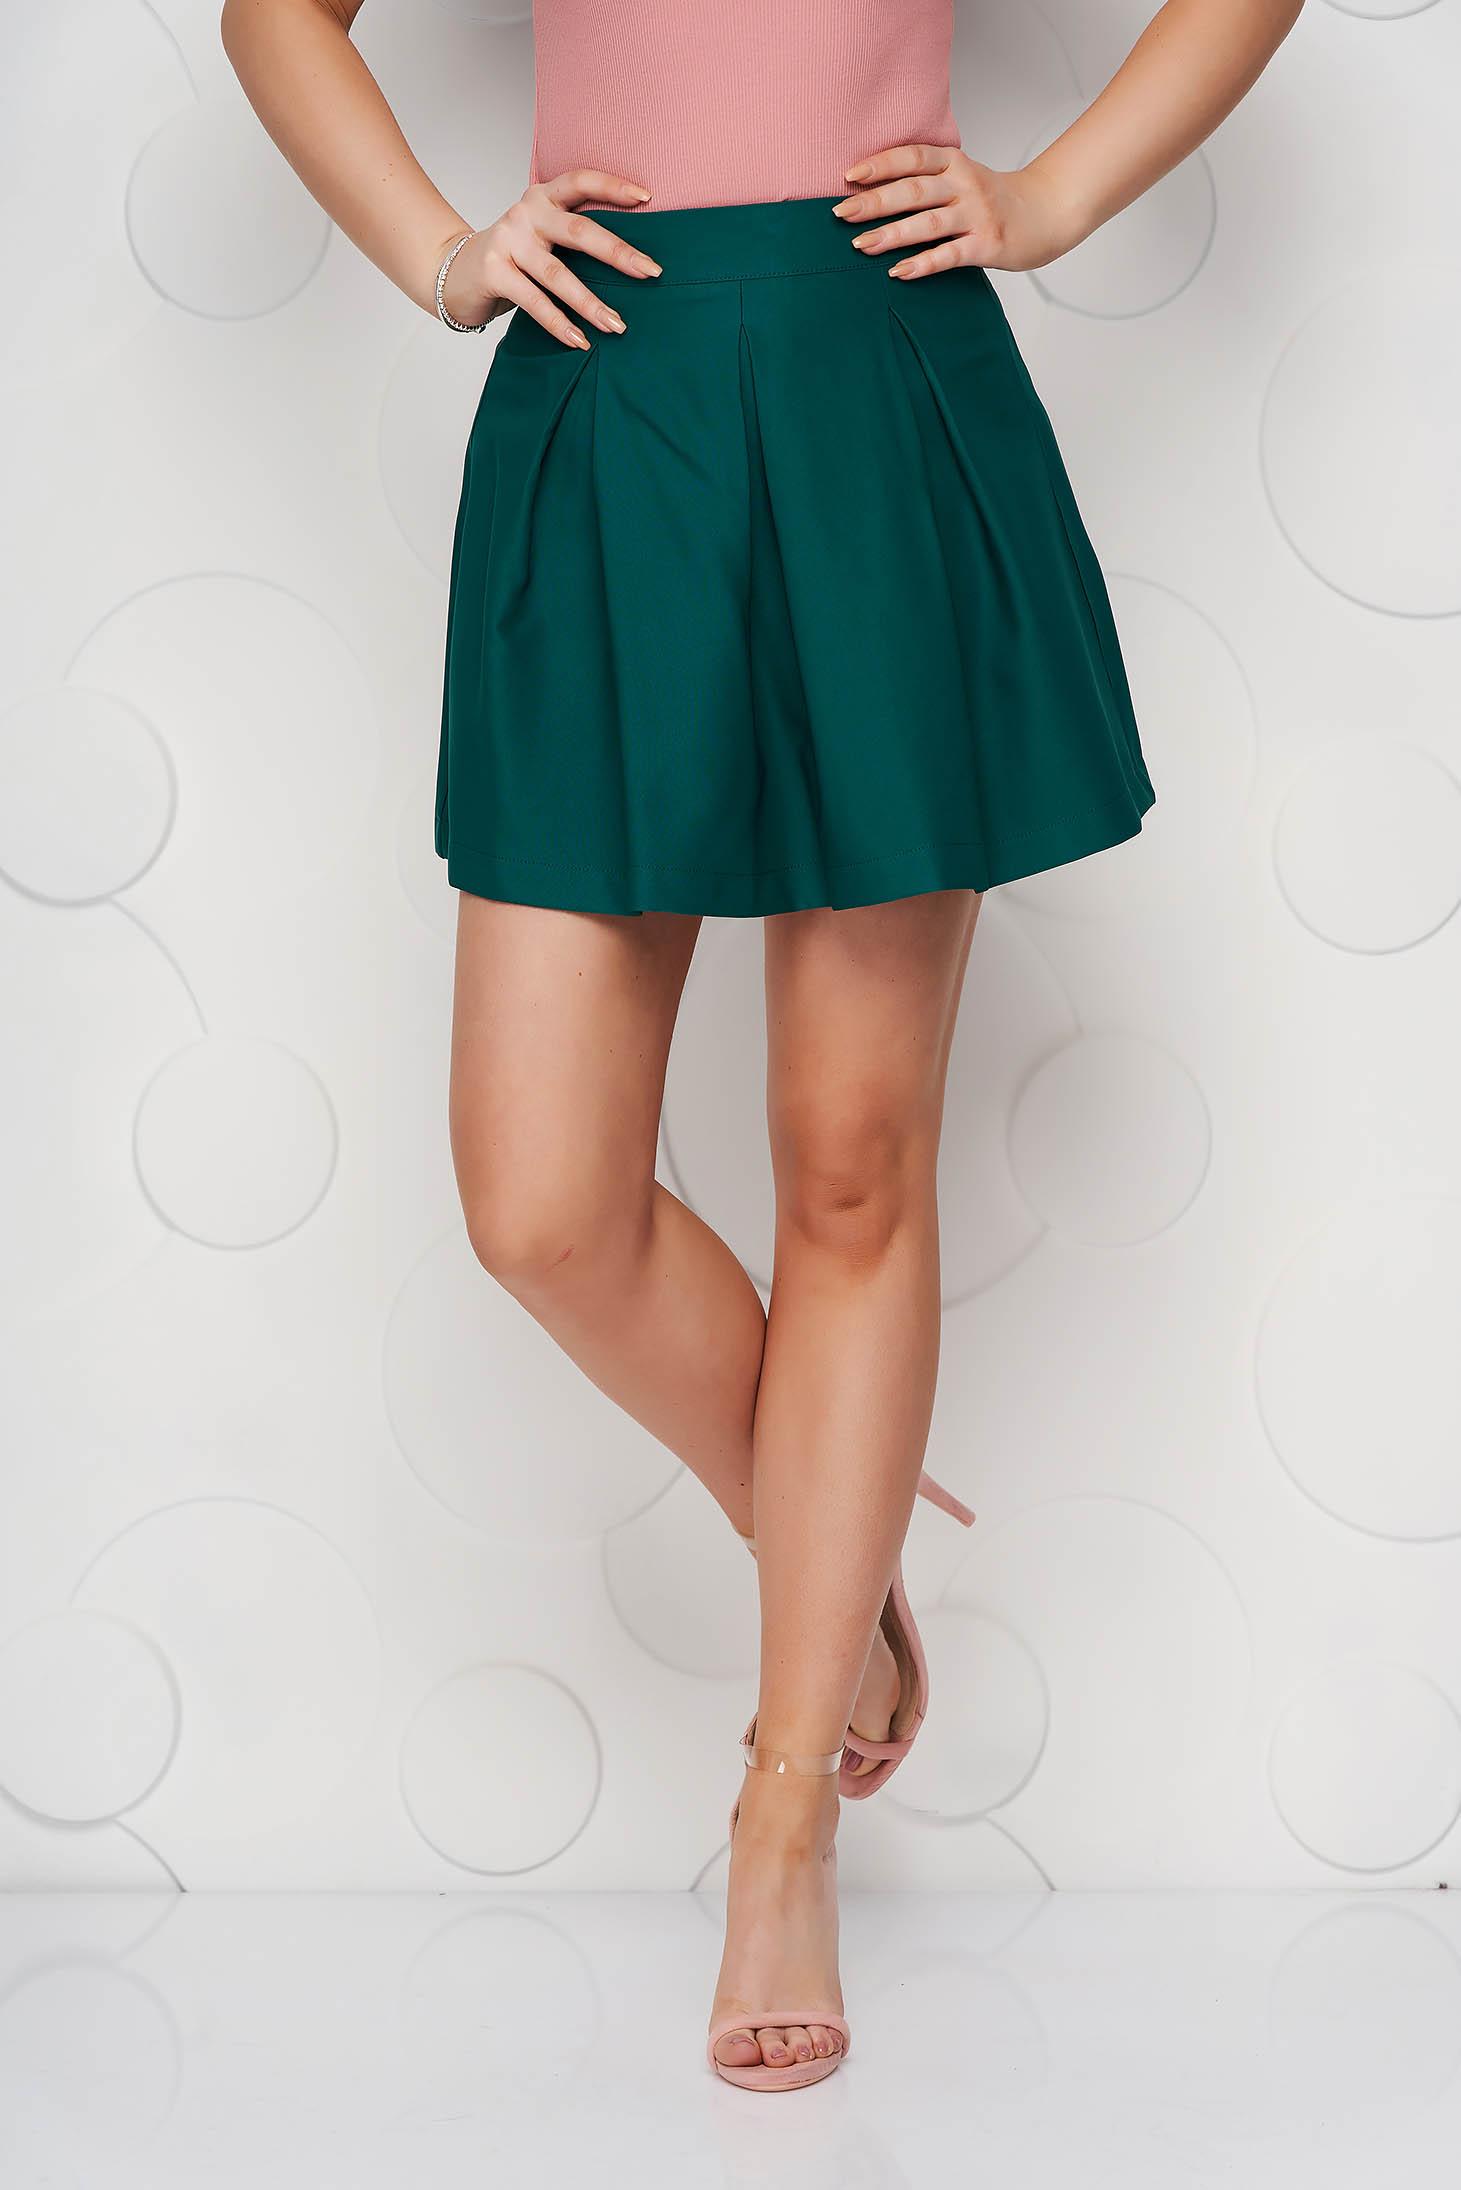 Dirty green casual cloche skirt slightly elastic fabric medium waist